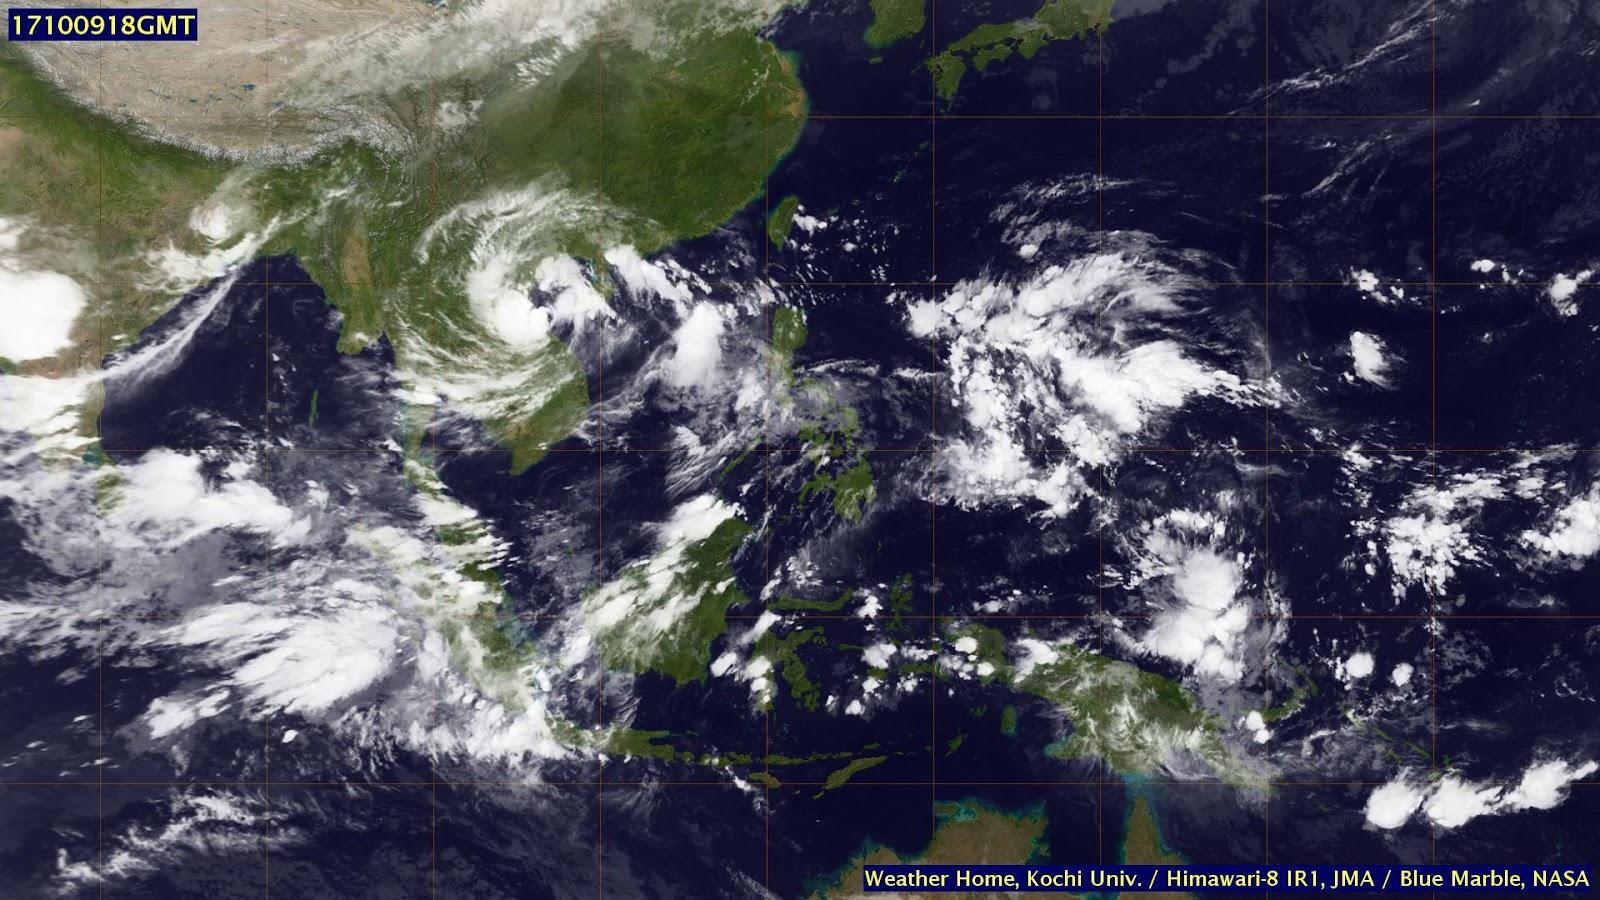 http://weather.is.kochi-u.ac.jp/HS/00Latest.jpg